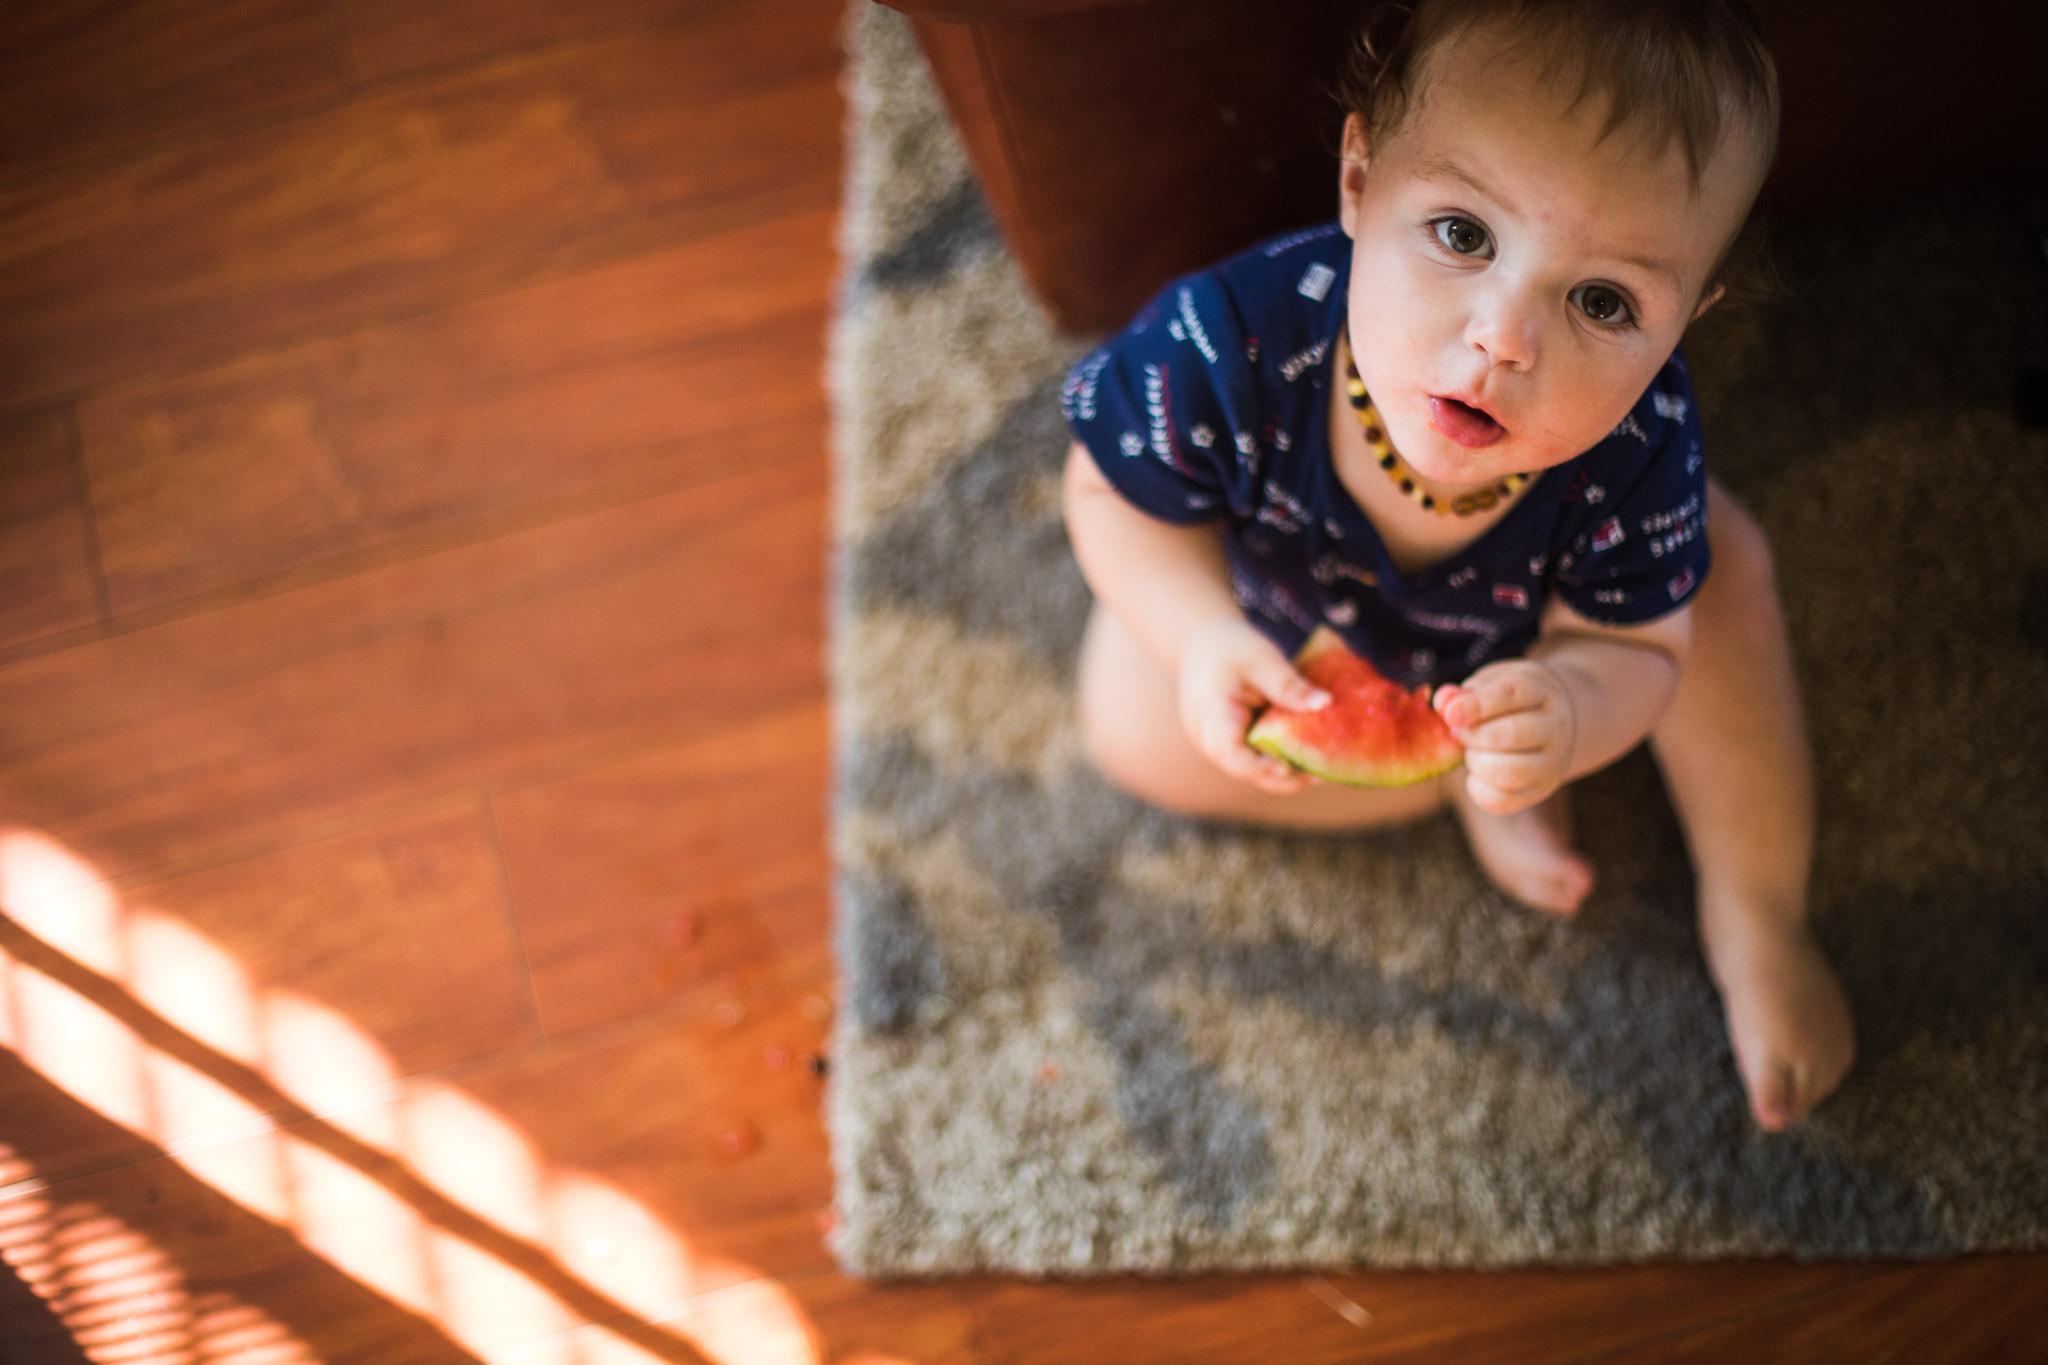 Archer_Inspired_Photography_Watermelon_Baby_Boy_Eating_Lifestyle_Photographer_California-31.jpg